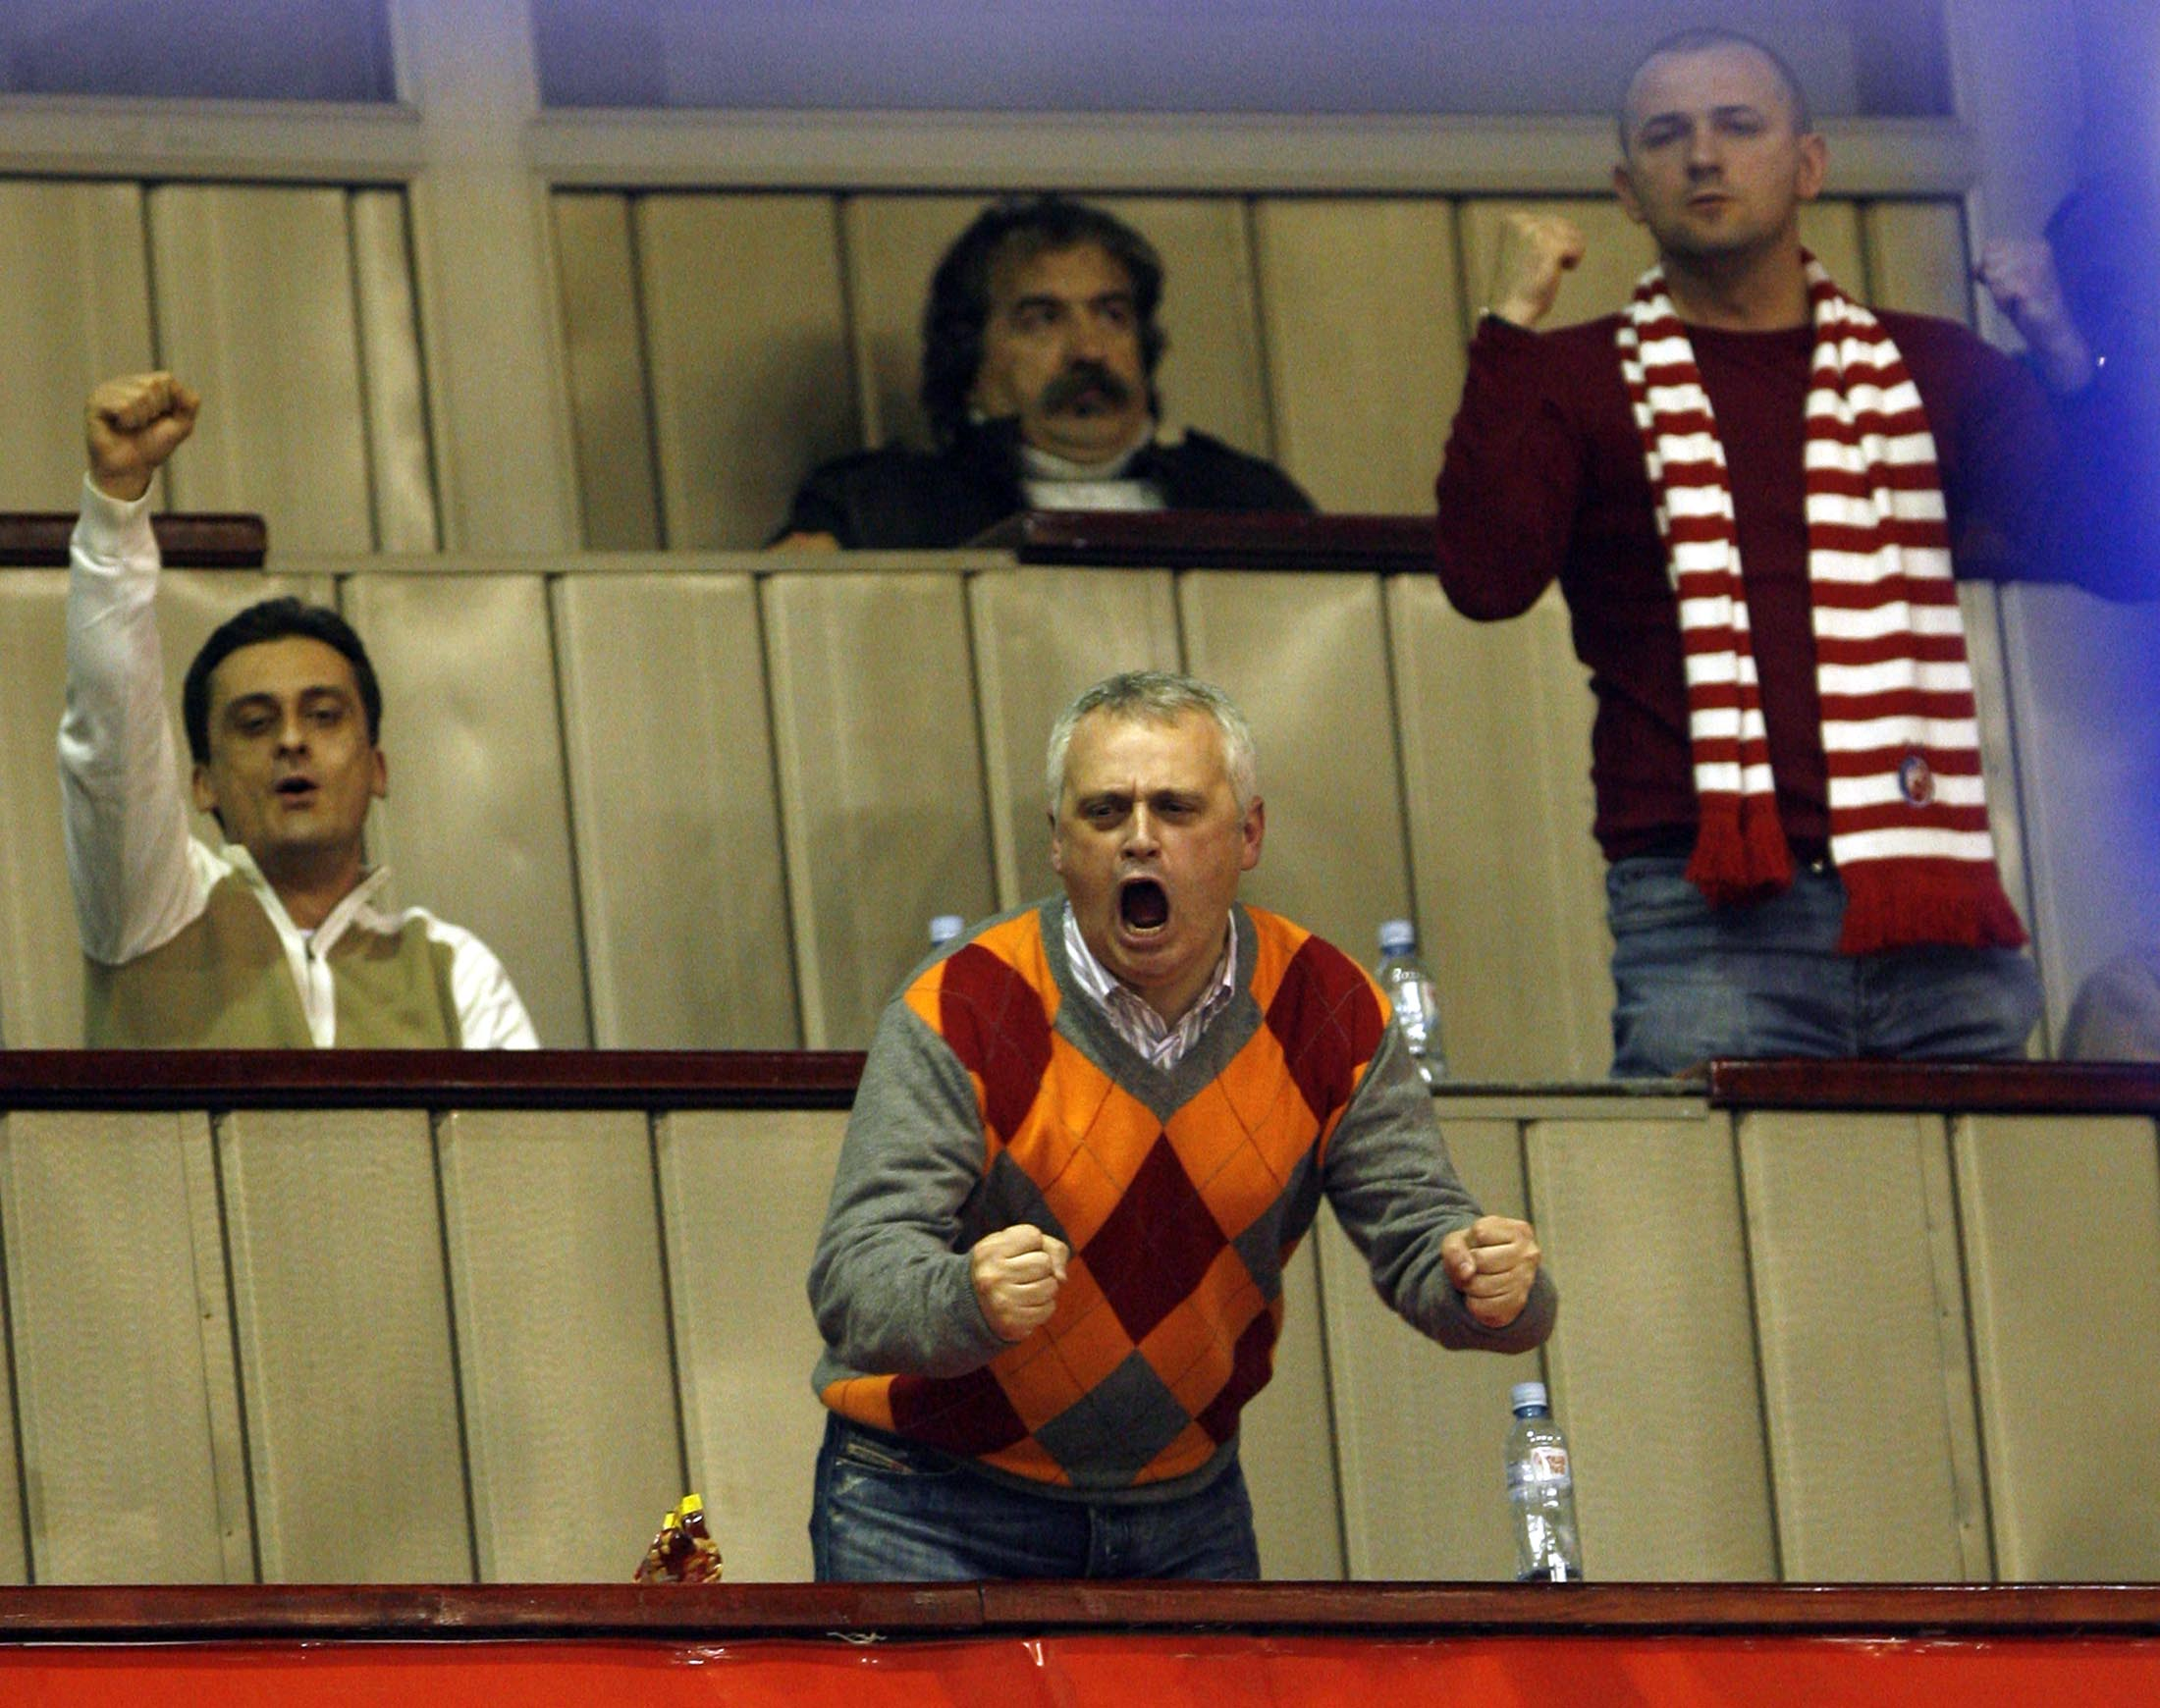 Goran Vesić na utakmici KK Crvena zvezda